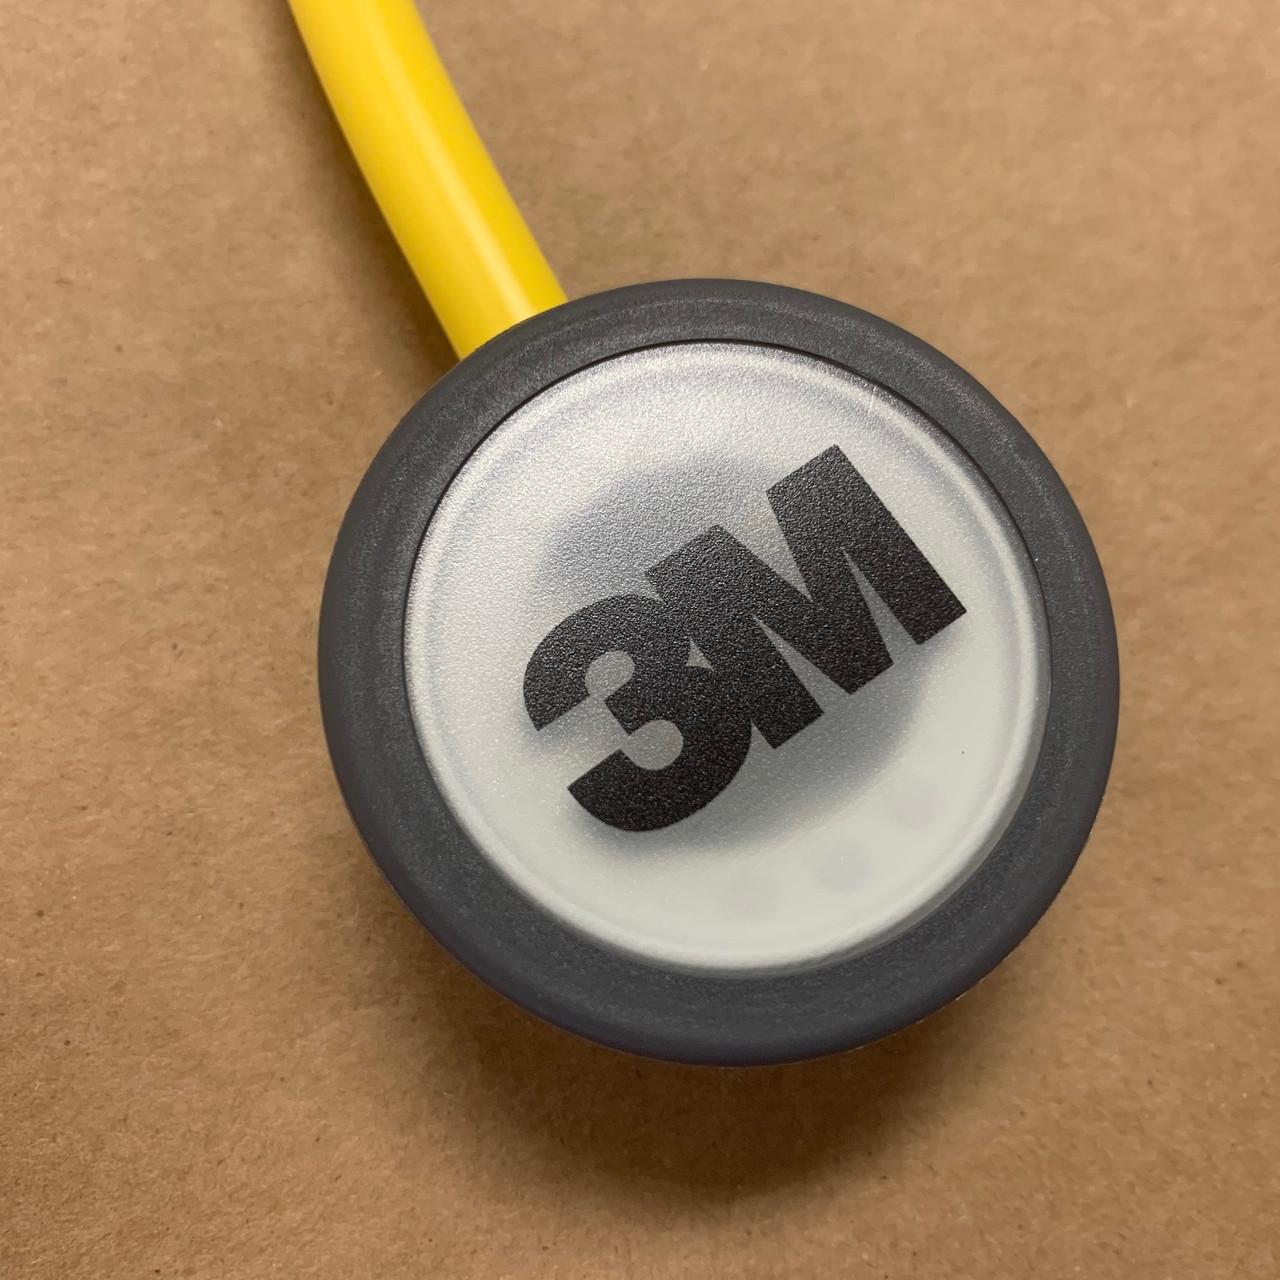 3M Single-Patient Stethoscope SPS-YA1100 100/case